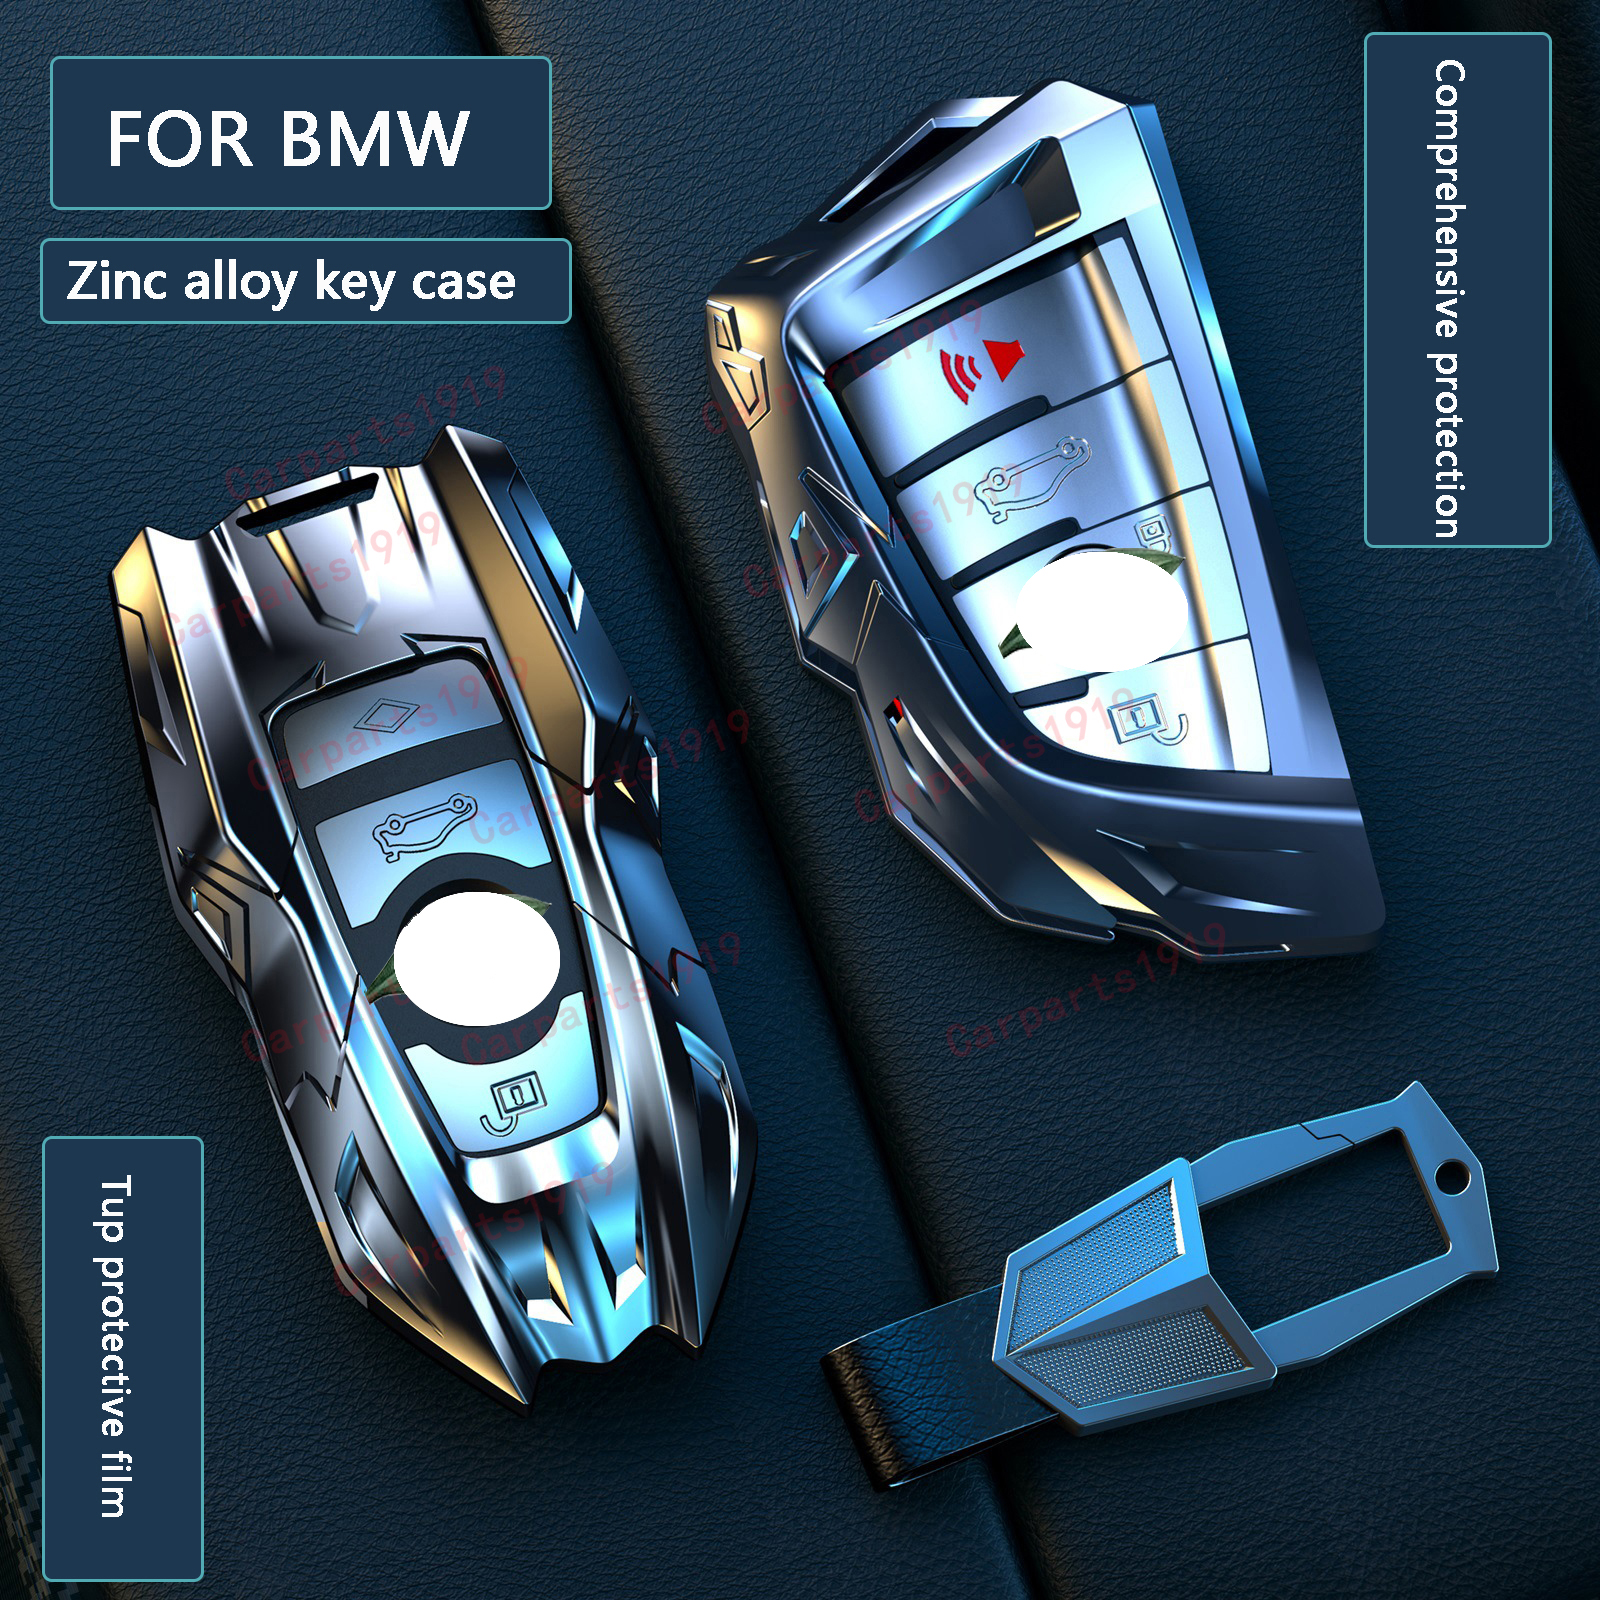 Zinc alloy Car Remote Key Case Cove  For BMW 520 525 f11 f30 f31 f10 F18 f48 118i 320i 1 2 3 4 5  7 Series  X3 X4 X5 X6 M3 M4 M5